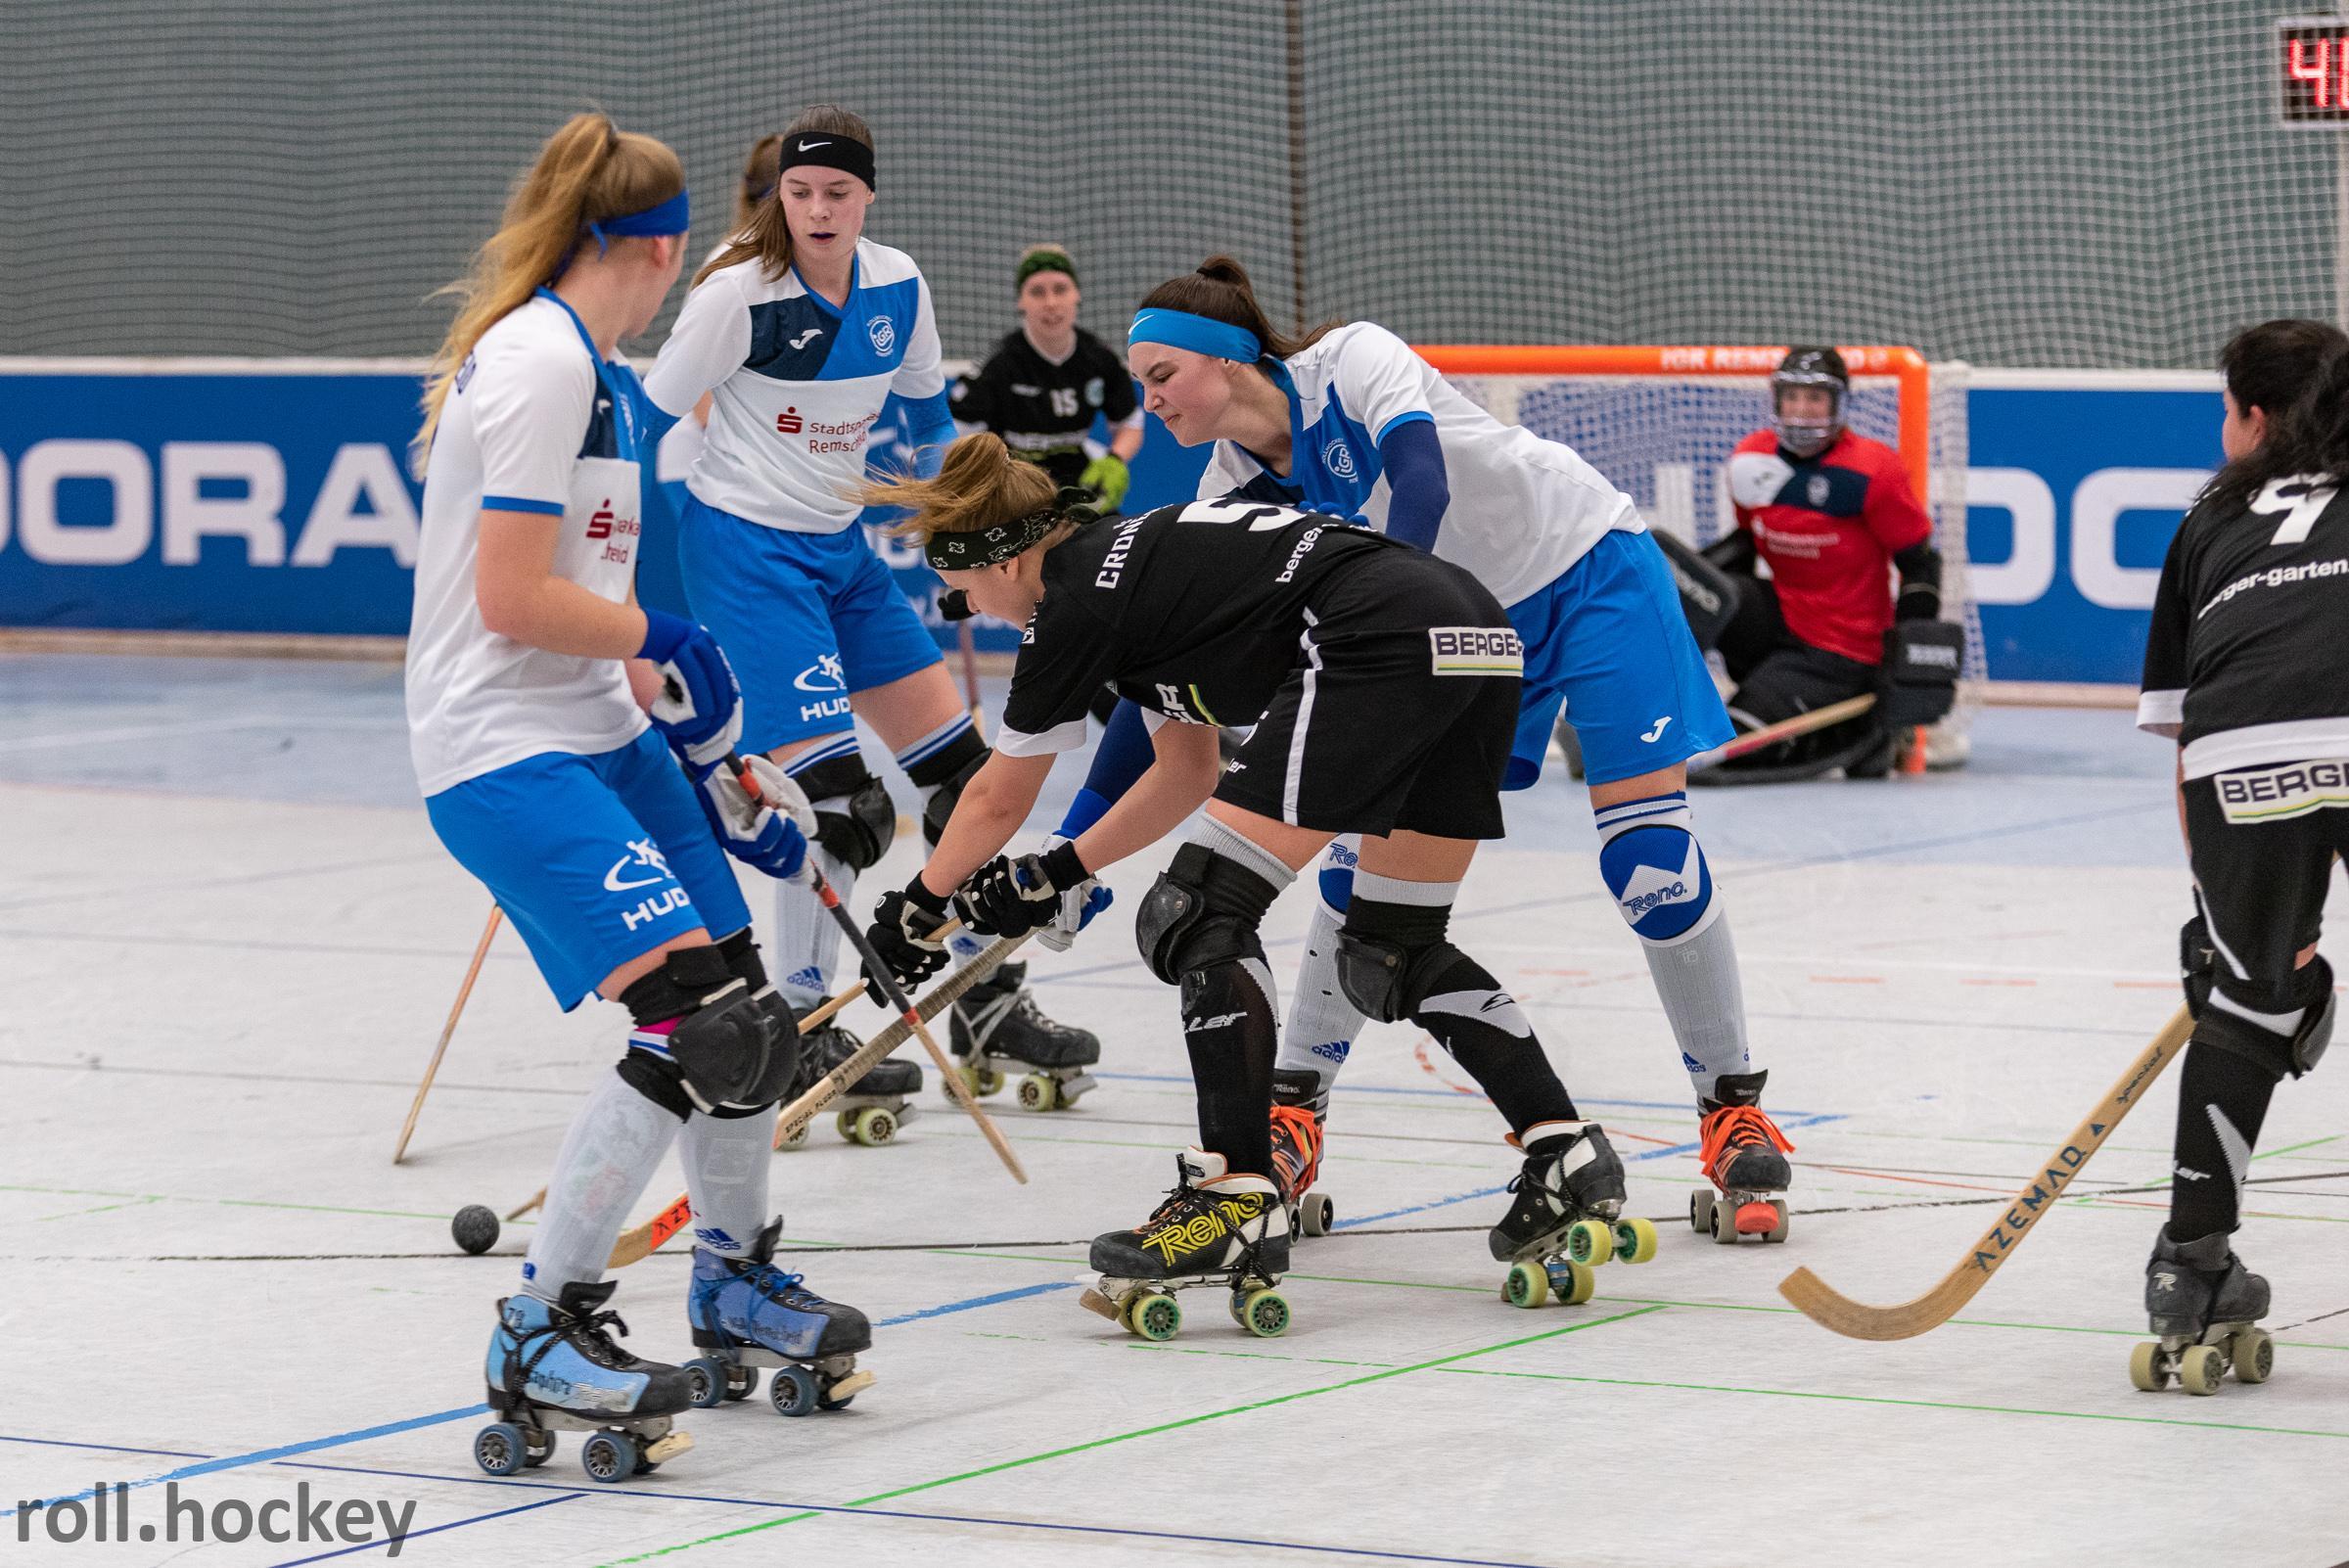 RSC Cronenberg DRIV-Pokal-Viertelfinale Damen 16.02.2019